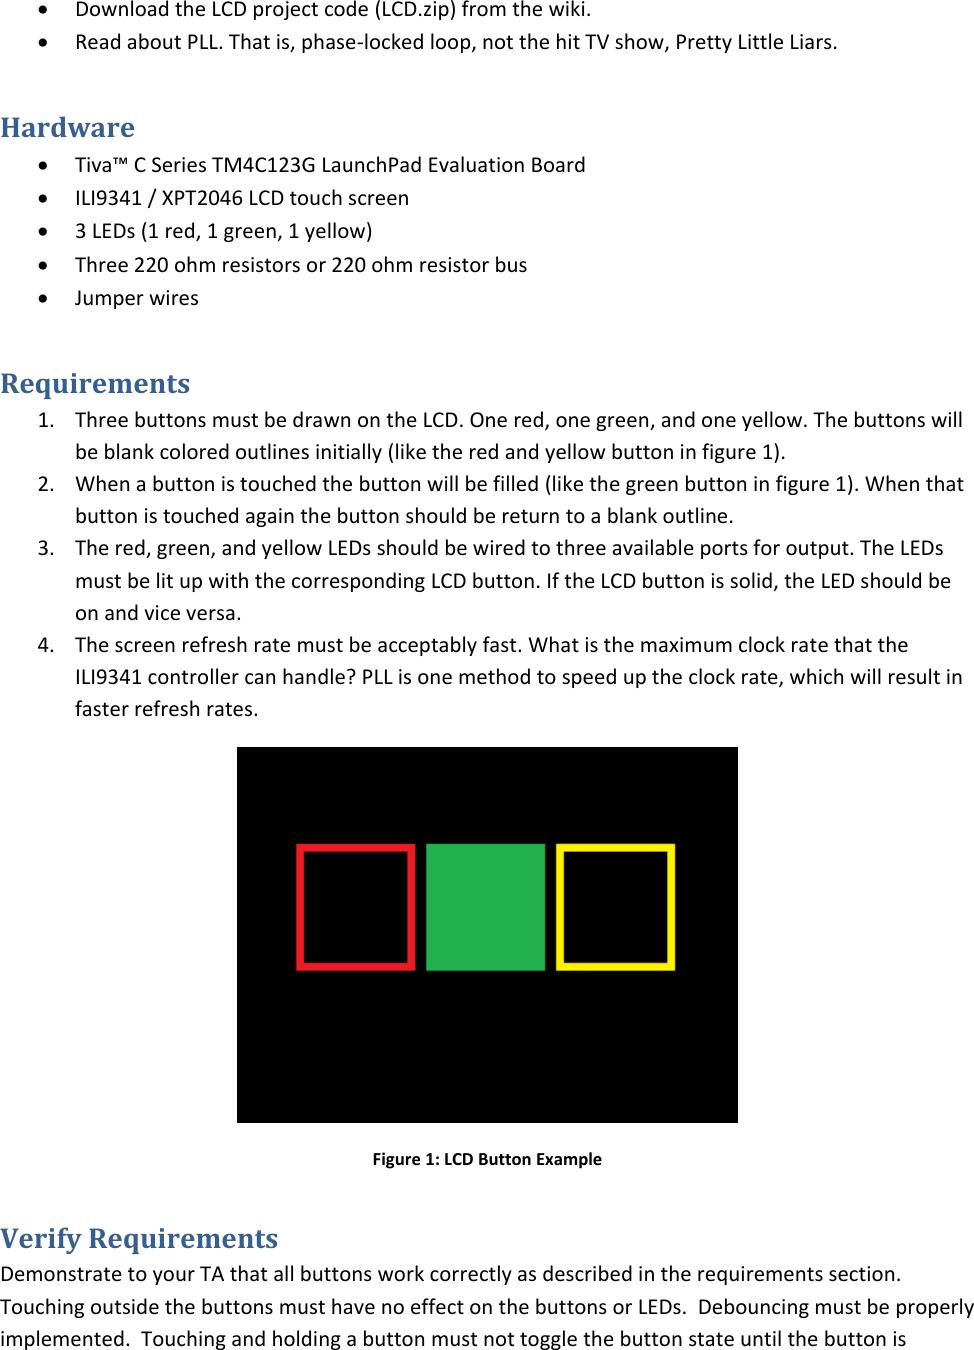 Lab5 Instructions